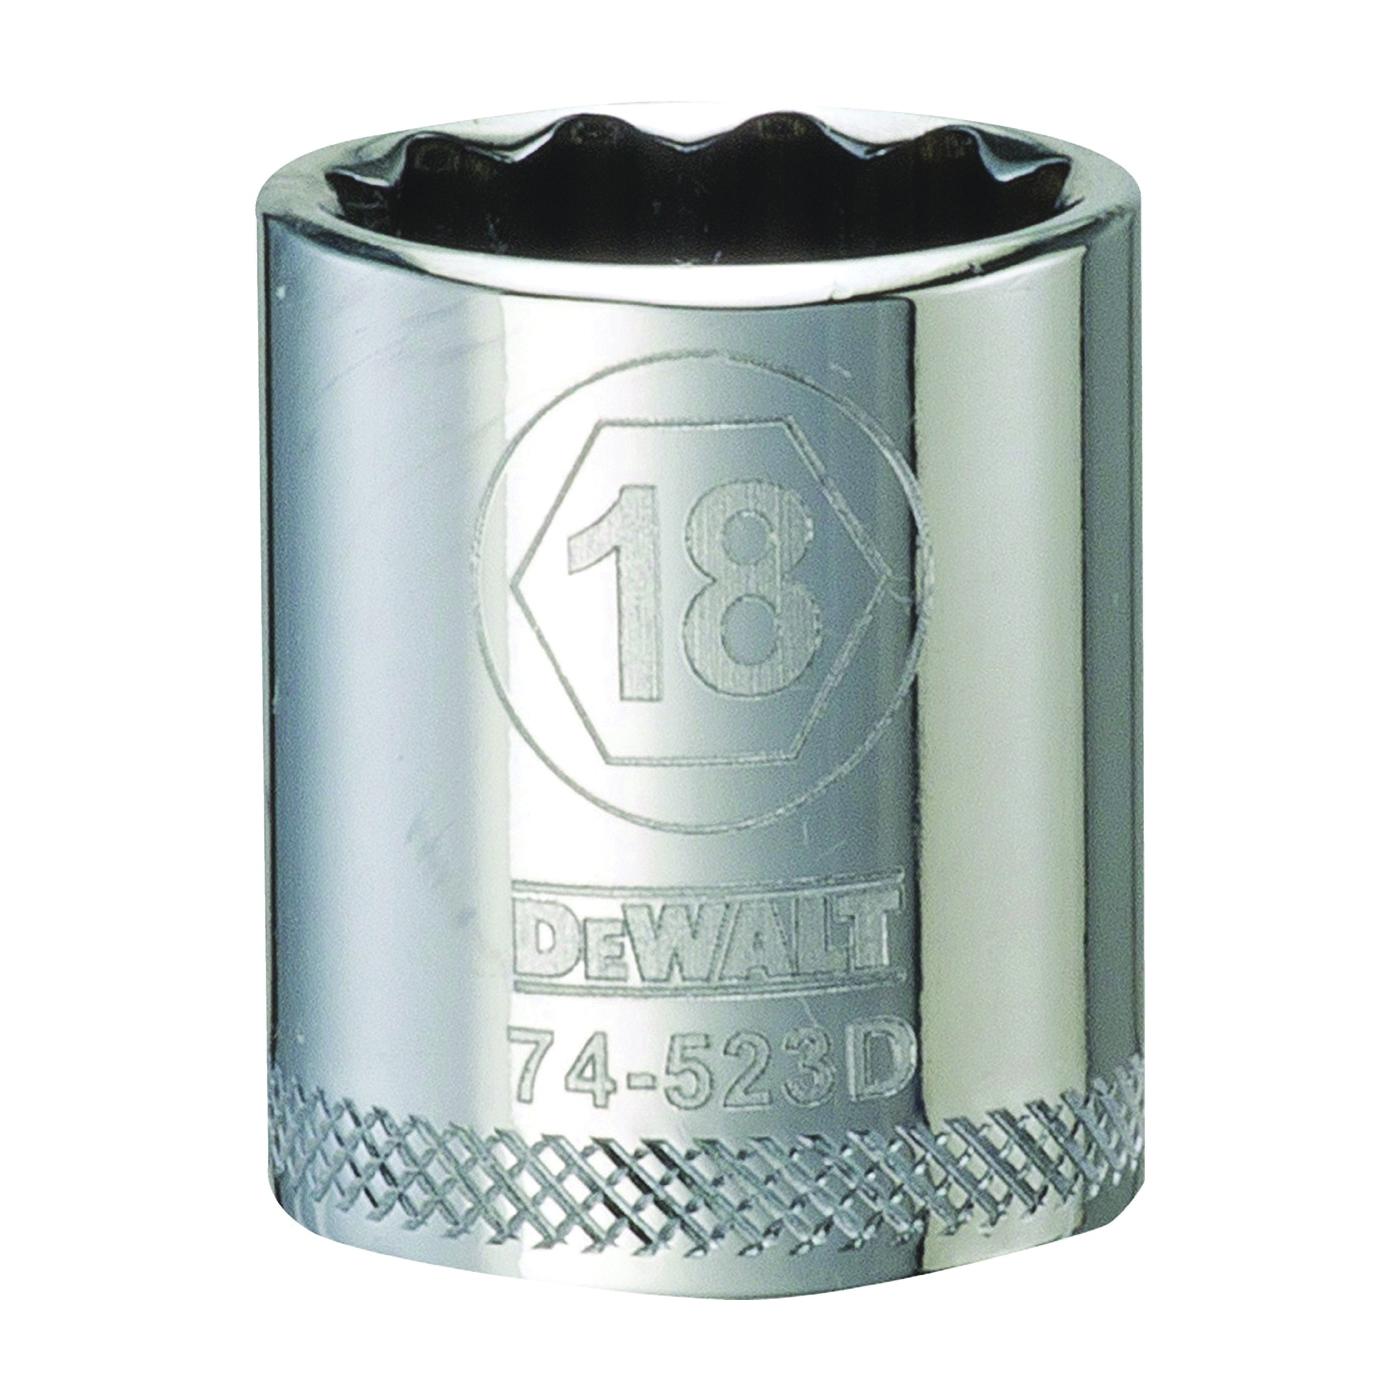 Picture of DeWALT DWMT74523OSP Hand Socket, 18 mm Socket, 3/8 in Drive, 12 -Point, Vanadium Steel, Polished Chrome